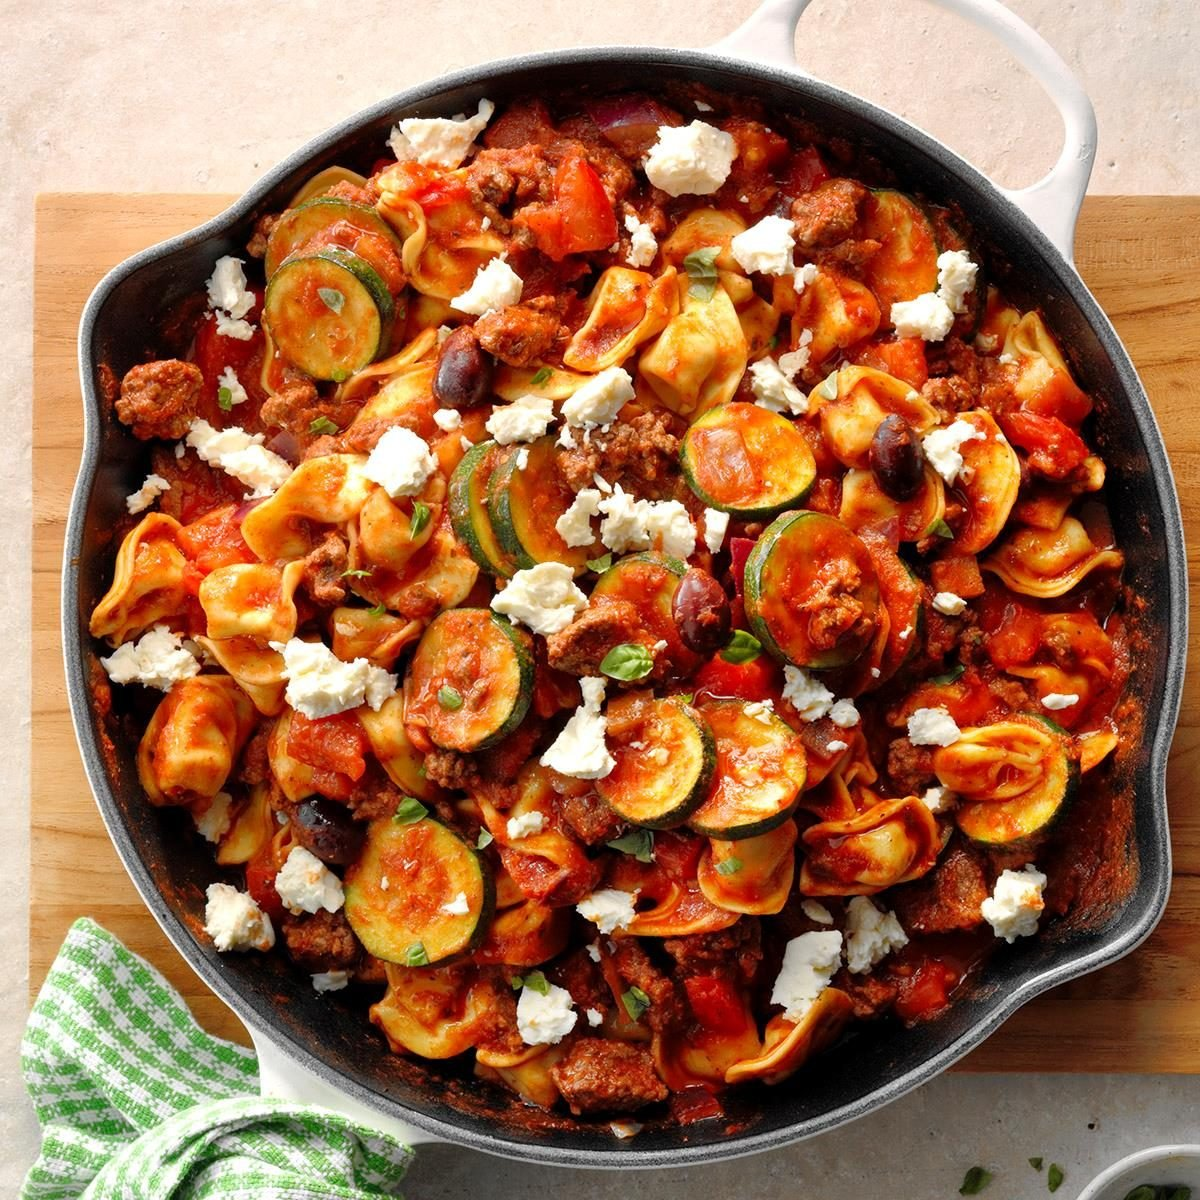 Easy Supper Recipes: Greek Tortellini Skillet Recipe